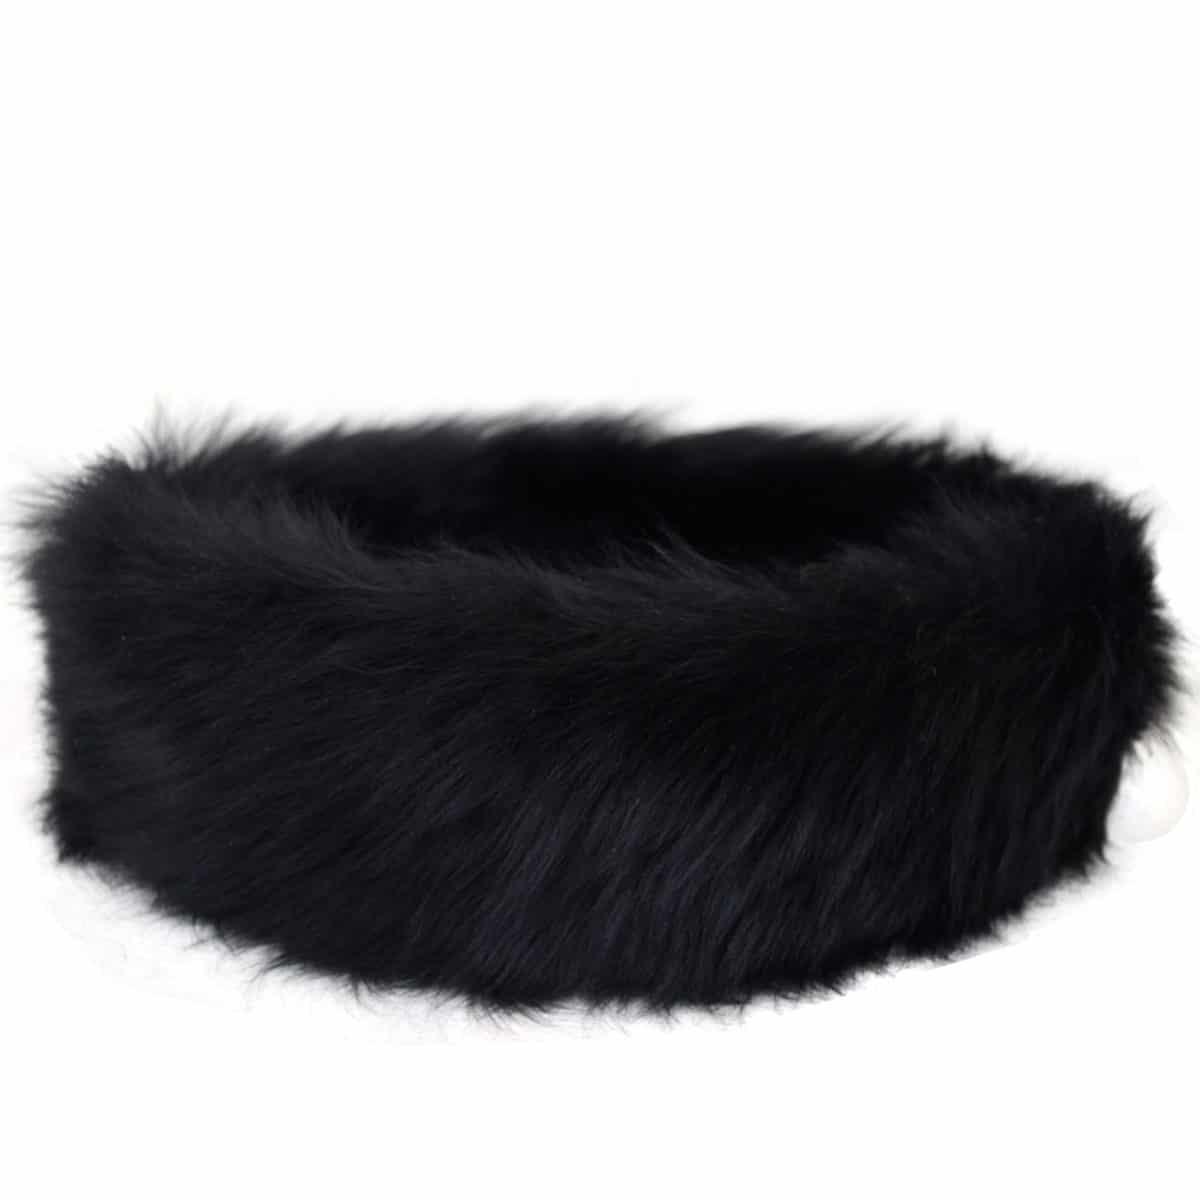 Alexi - Ladies Long Sheepskin Ski Headband - Black